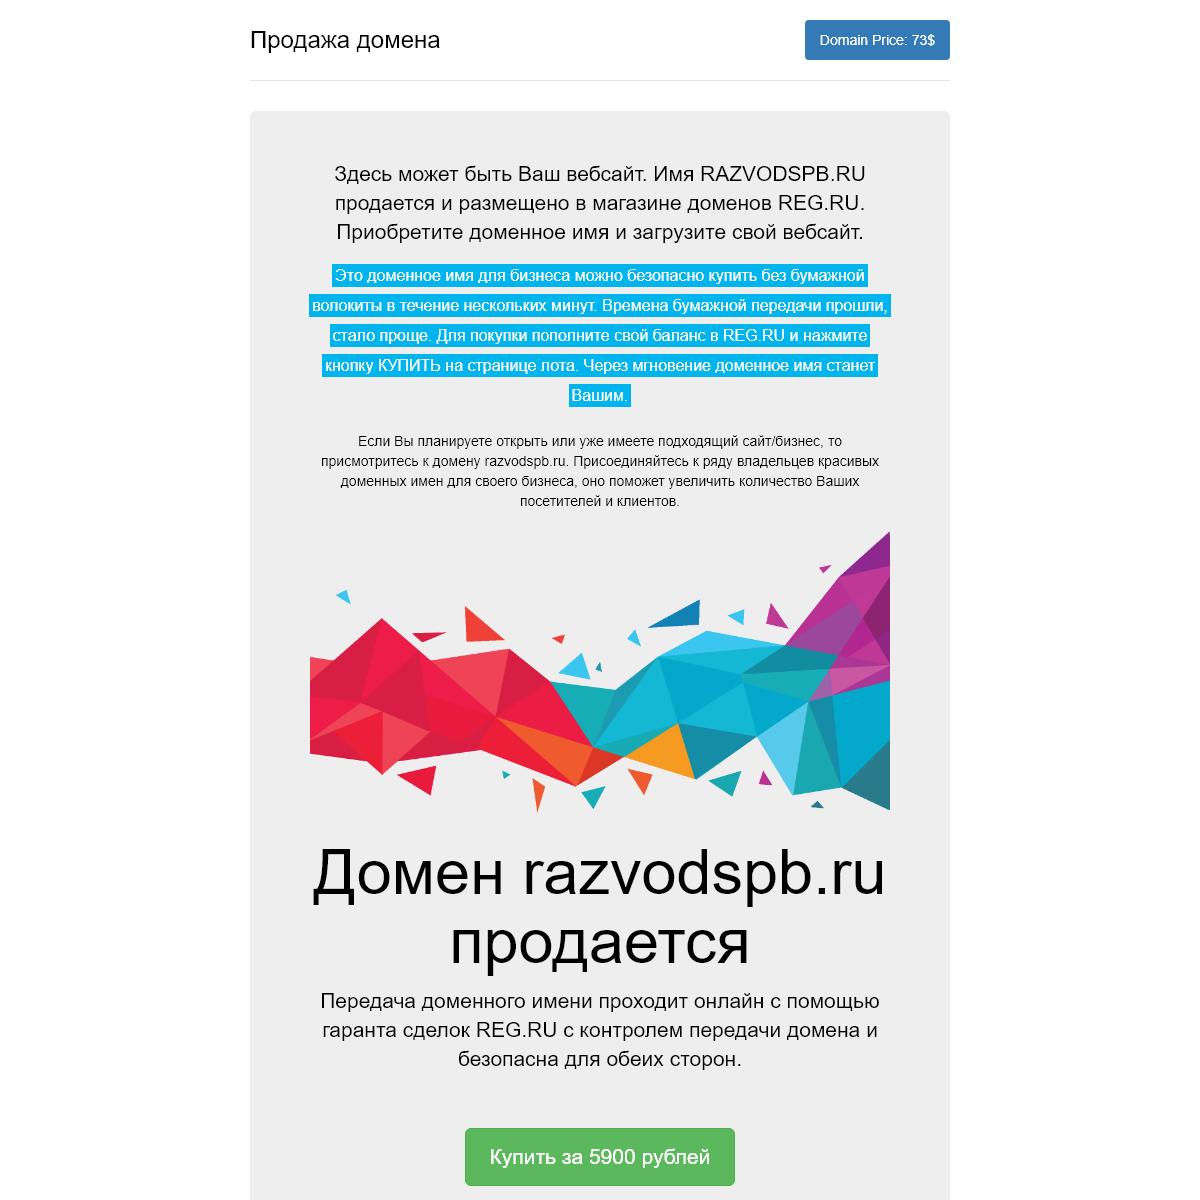 Домен razvodspb.ru продается